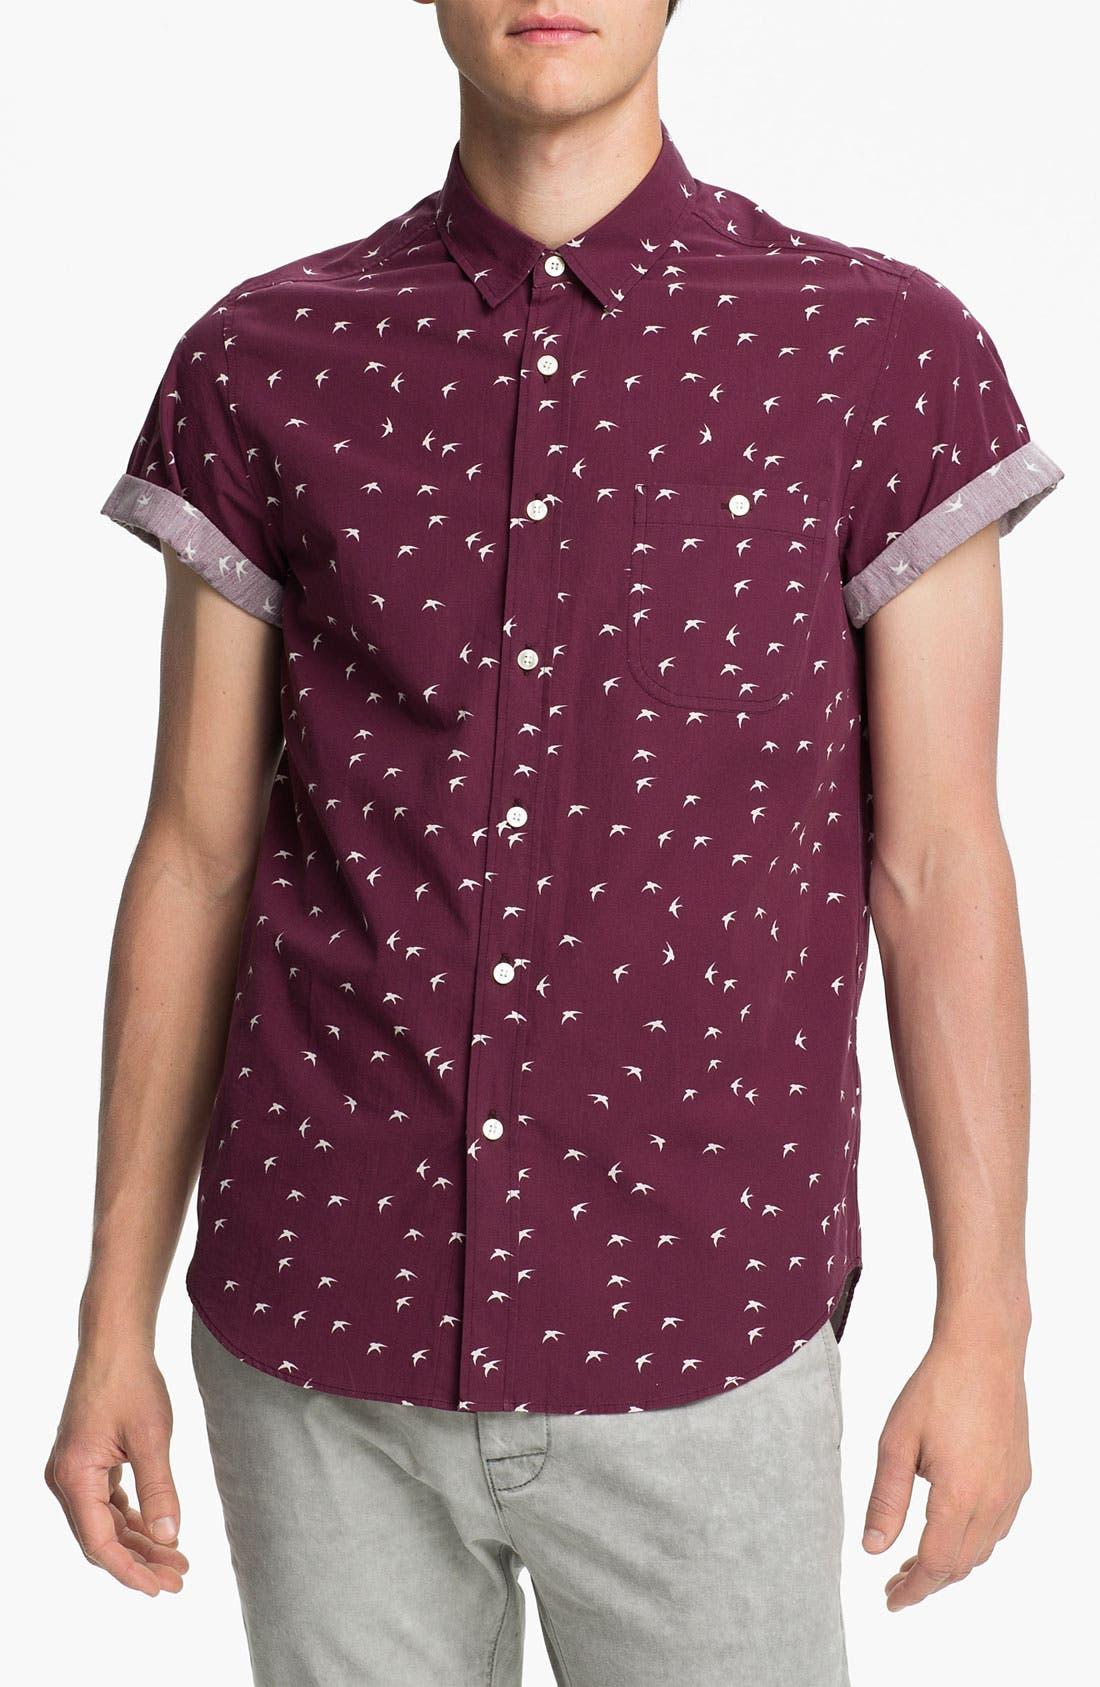 Alternate Image 1 Selected - Topman Swallow Print Woven Shirt